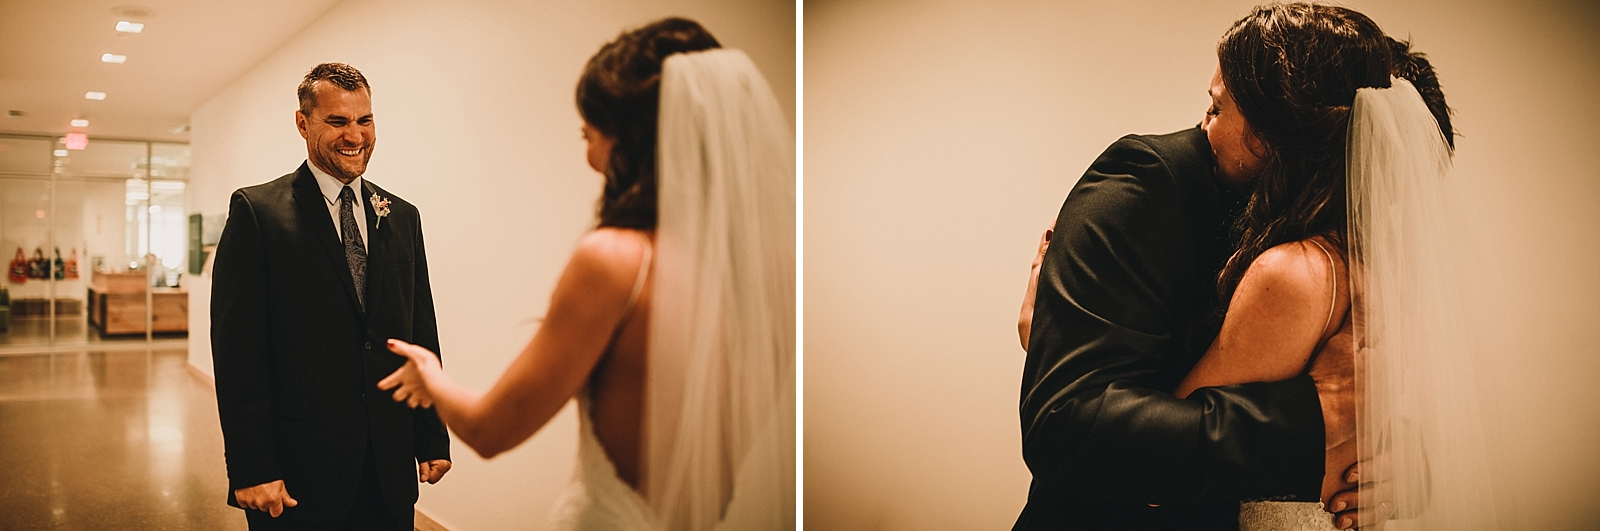 Brielle&Rob-TanaHelenePhotography-302_WEB.jpg